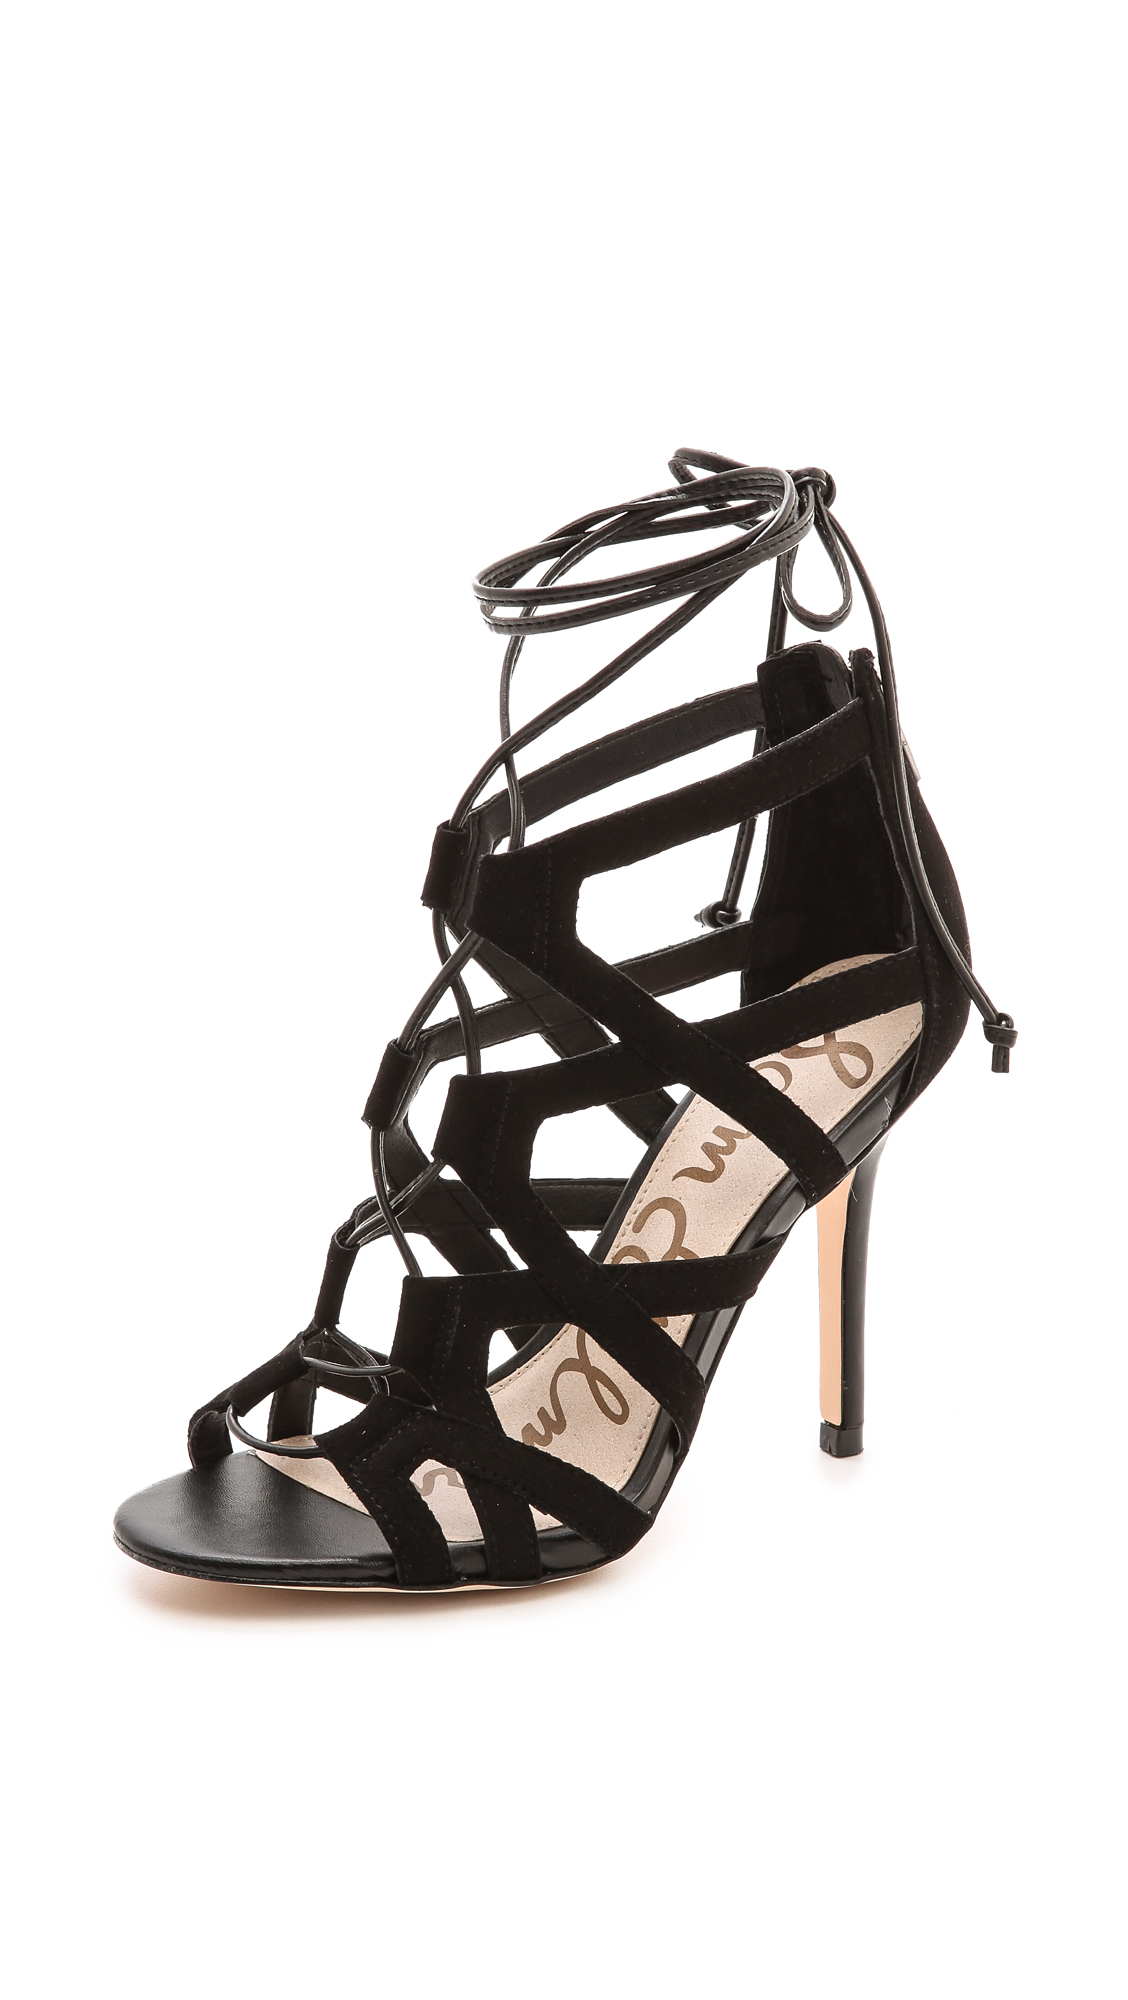 Sam edelman almira lace up sandals